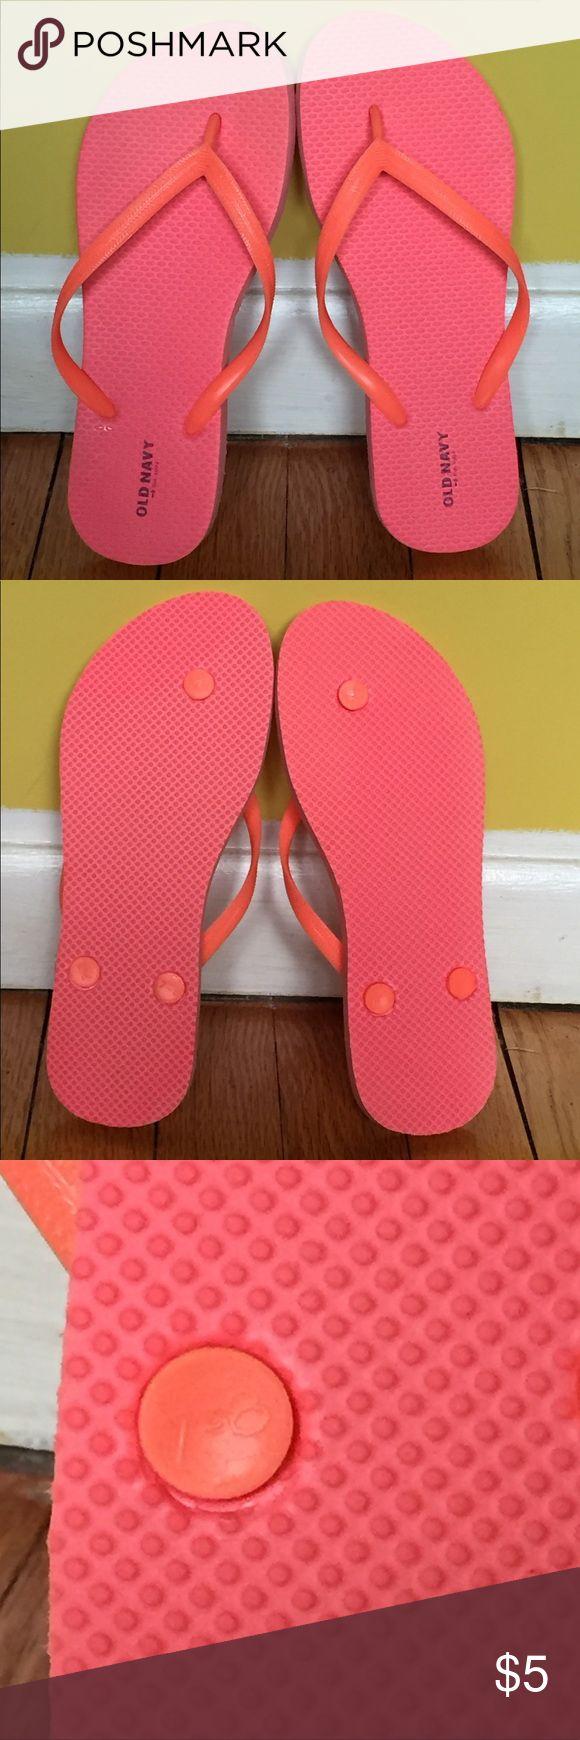 NWOT Old Navy coral flip flops size 7-8 NWOT Old Navy dark gray and purple flip flops size 7-8. Never worn Old Navy Shoes Sandals